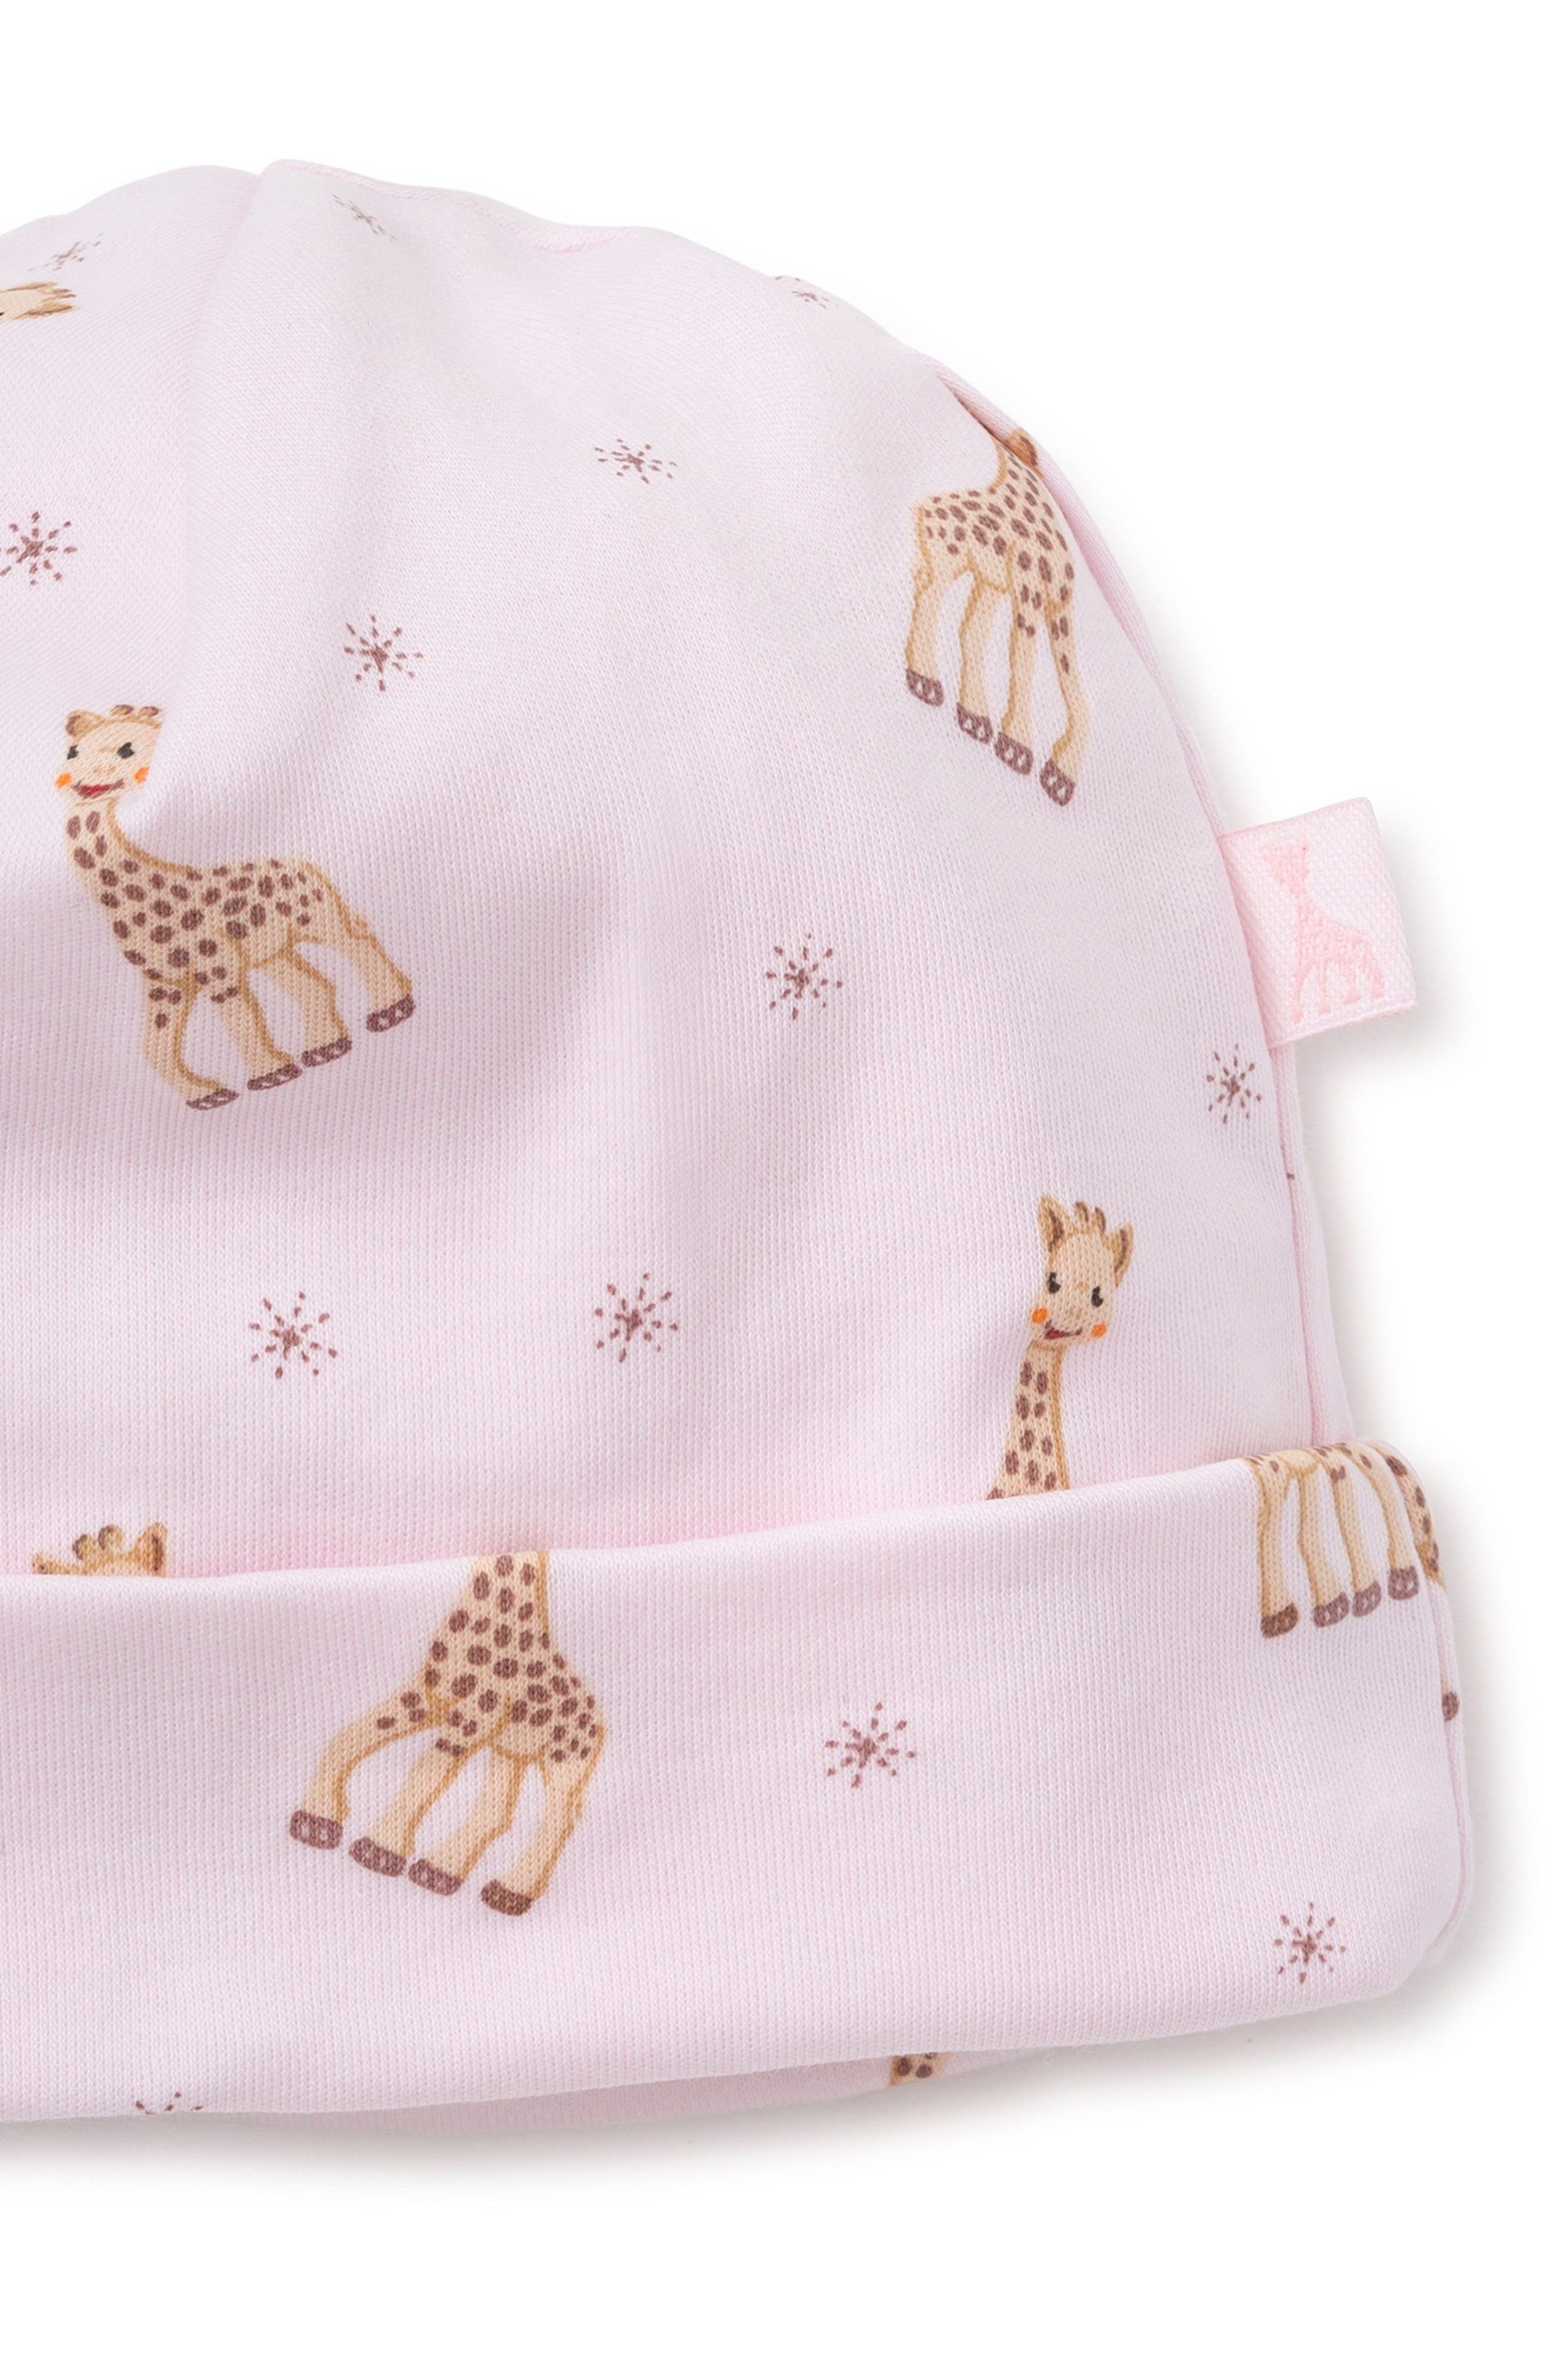 x Sophie la Girafe Beanie Hat,                             Alternate thumbnail 2, color,                             PINK